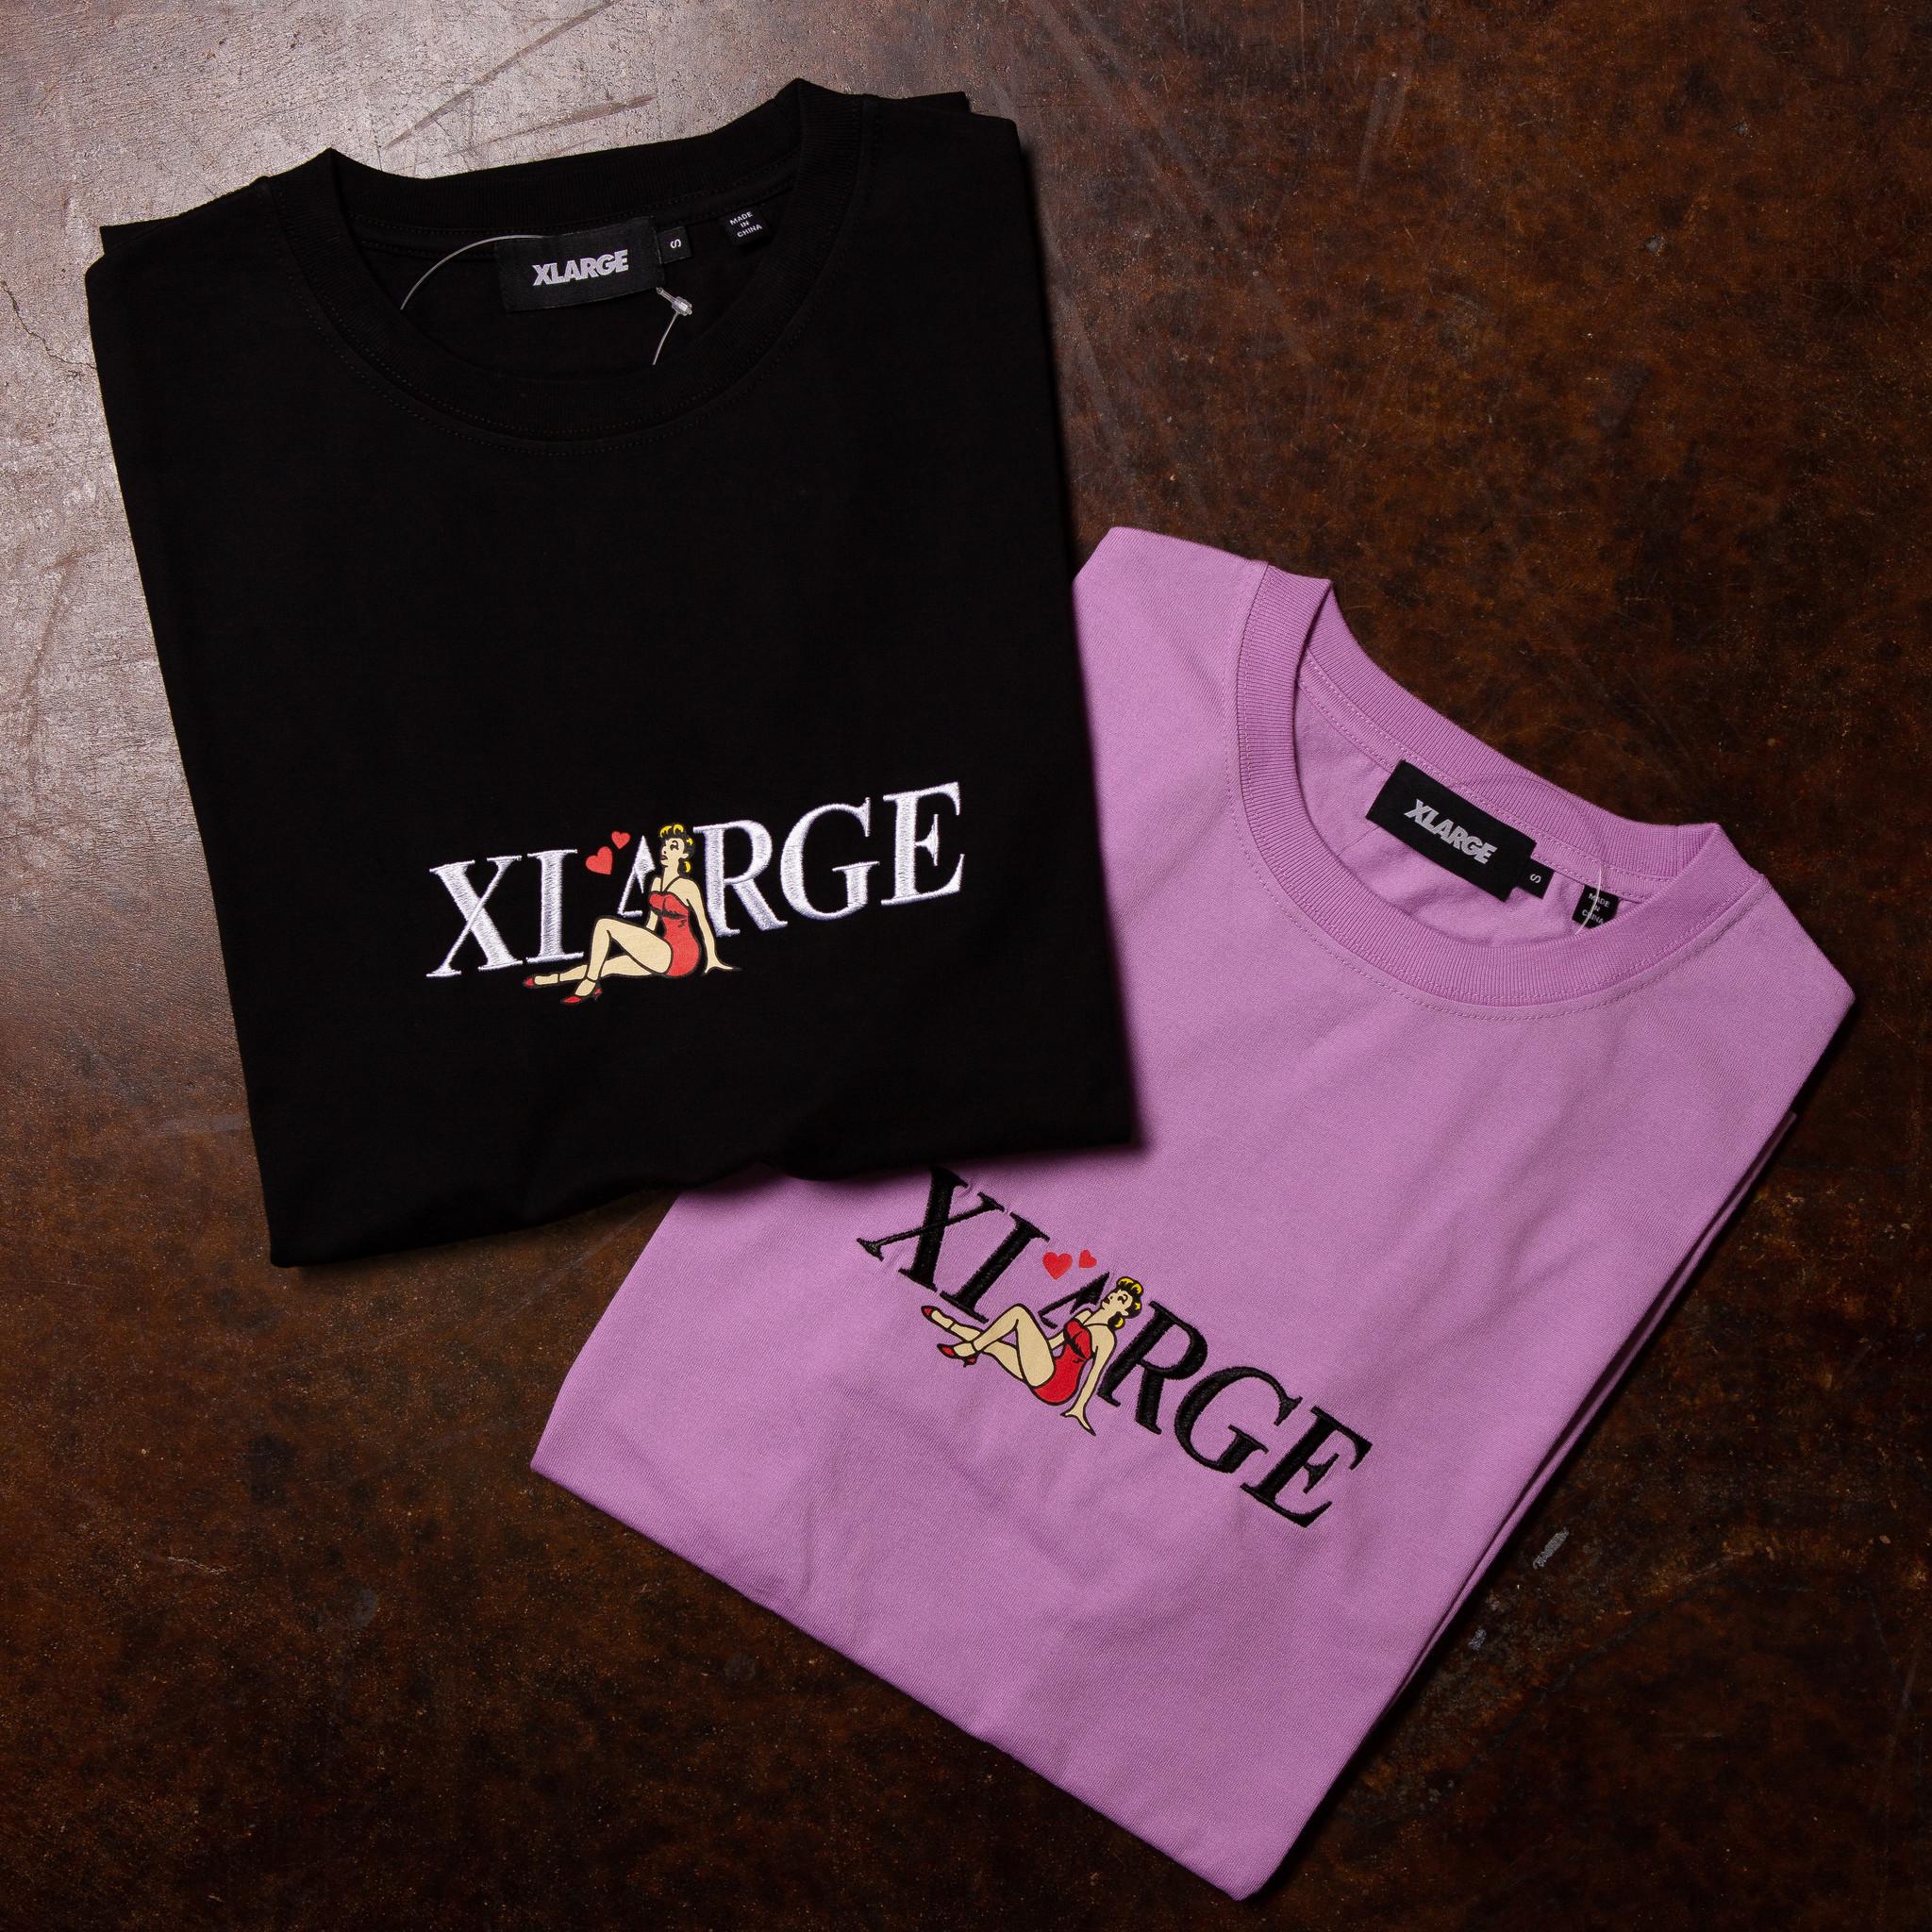 XLarge Alone S/S Tee